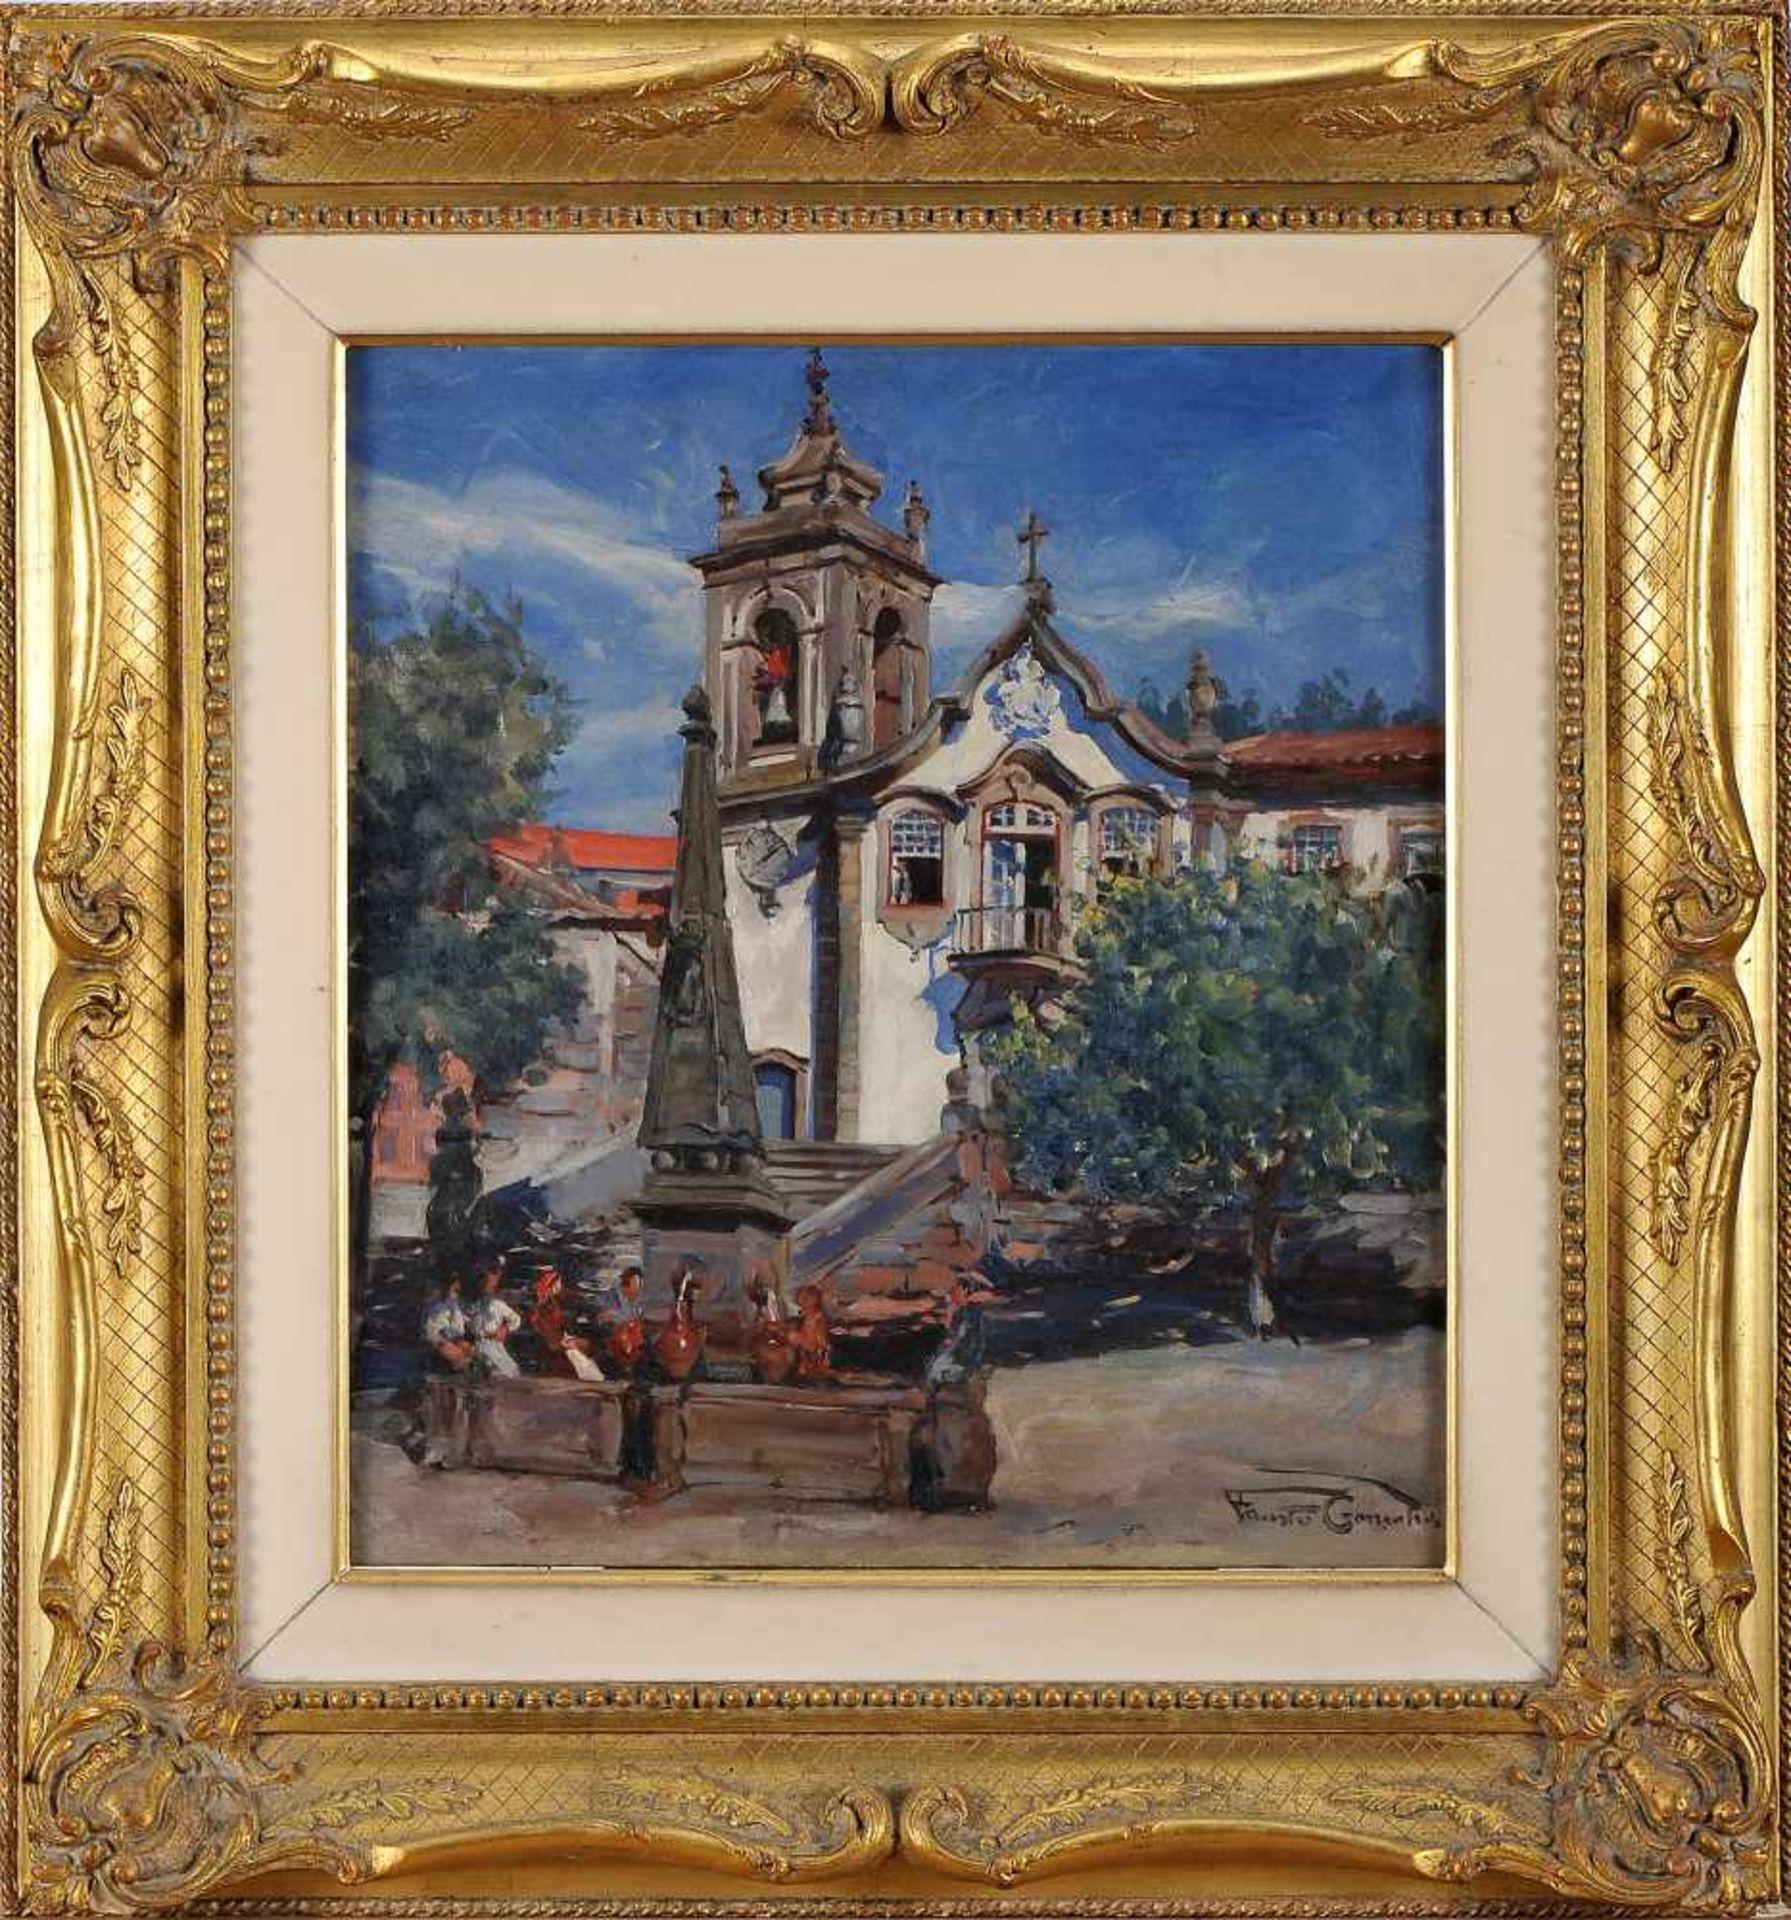 Los 87 - The Seia ChurchFAUSTO GONÇALVES - 1893-1947, The Seia Church, oil on canvas, relined, small...